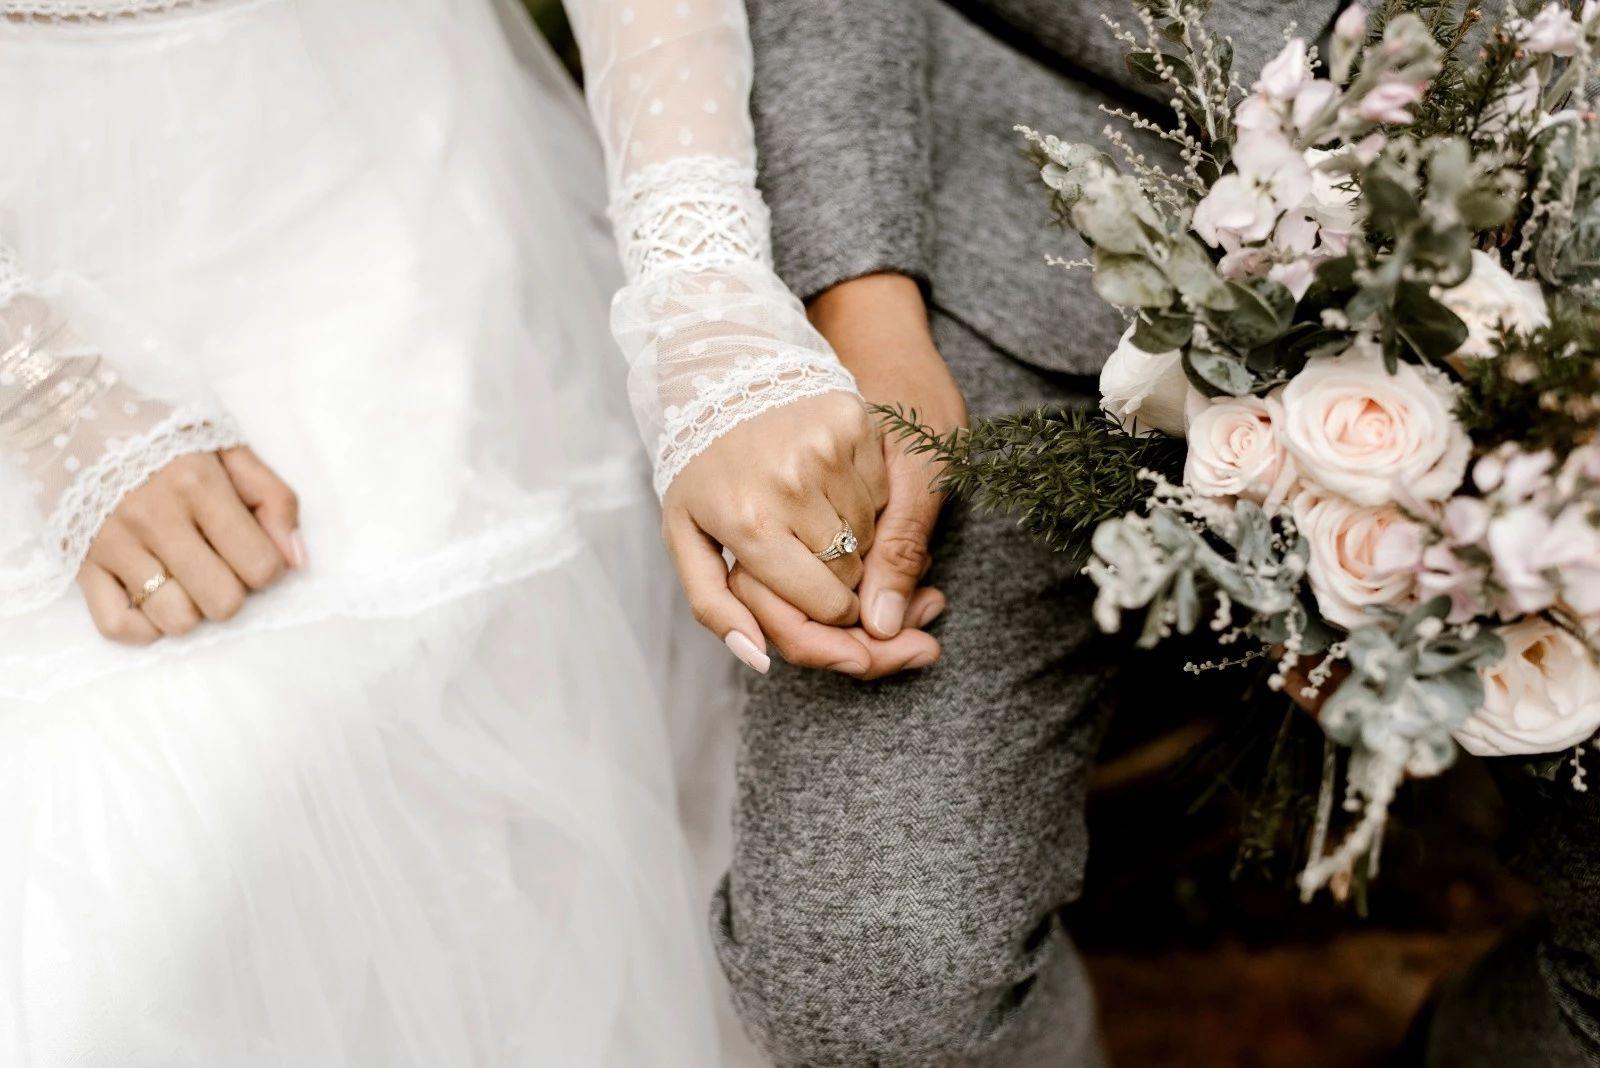 bride-and-groom-holding-hands-2959190.jpg